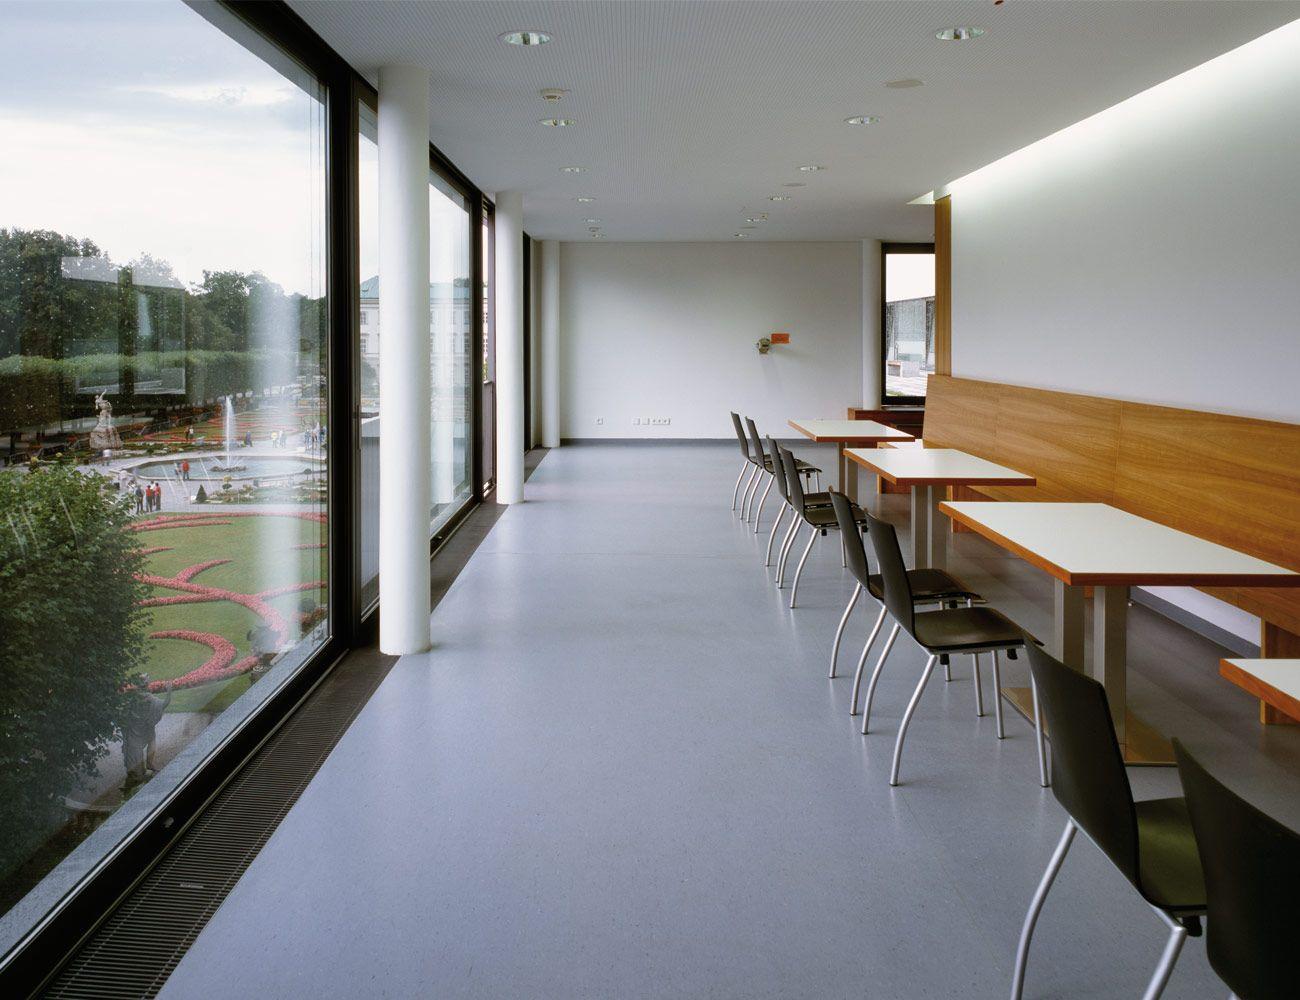 dlw linoleum referenzen universit t mozarteum in salzburg armstrong linoleum pinterest. Black Bedroom Furniture Sets. Home Design Ideas